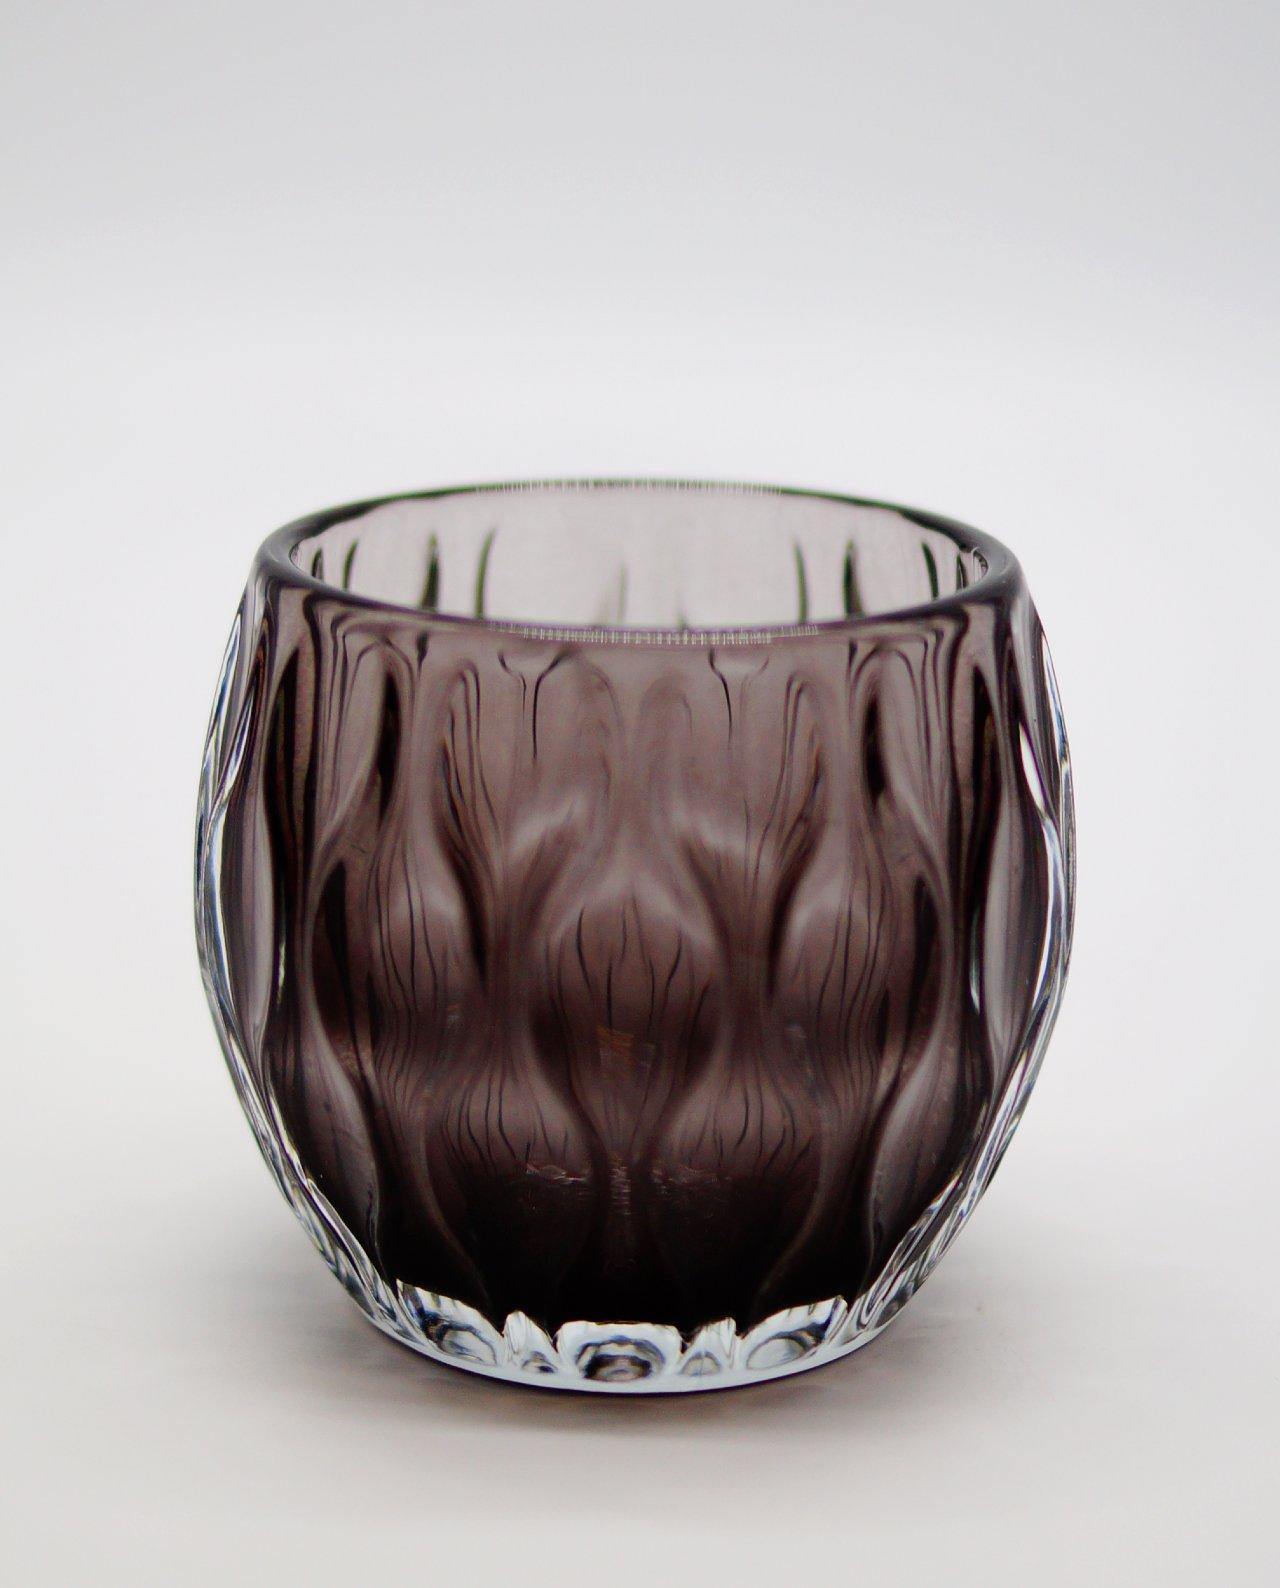 Votive of heavy tealight purple glass